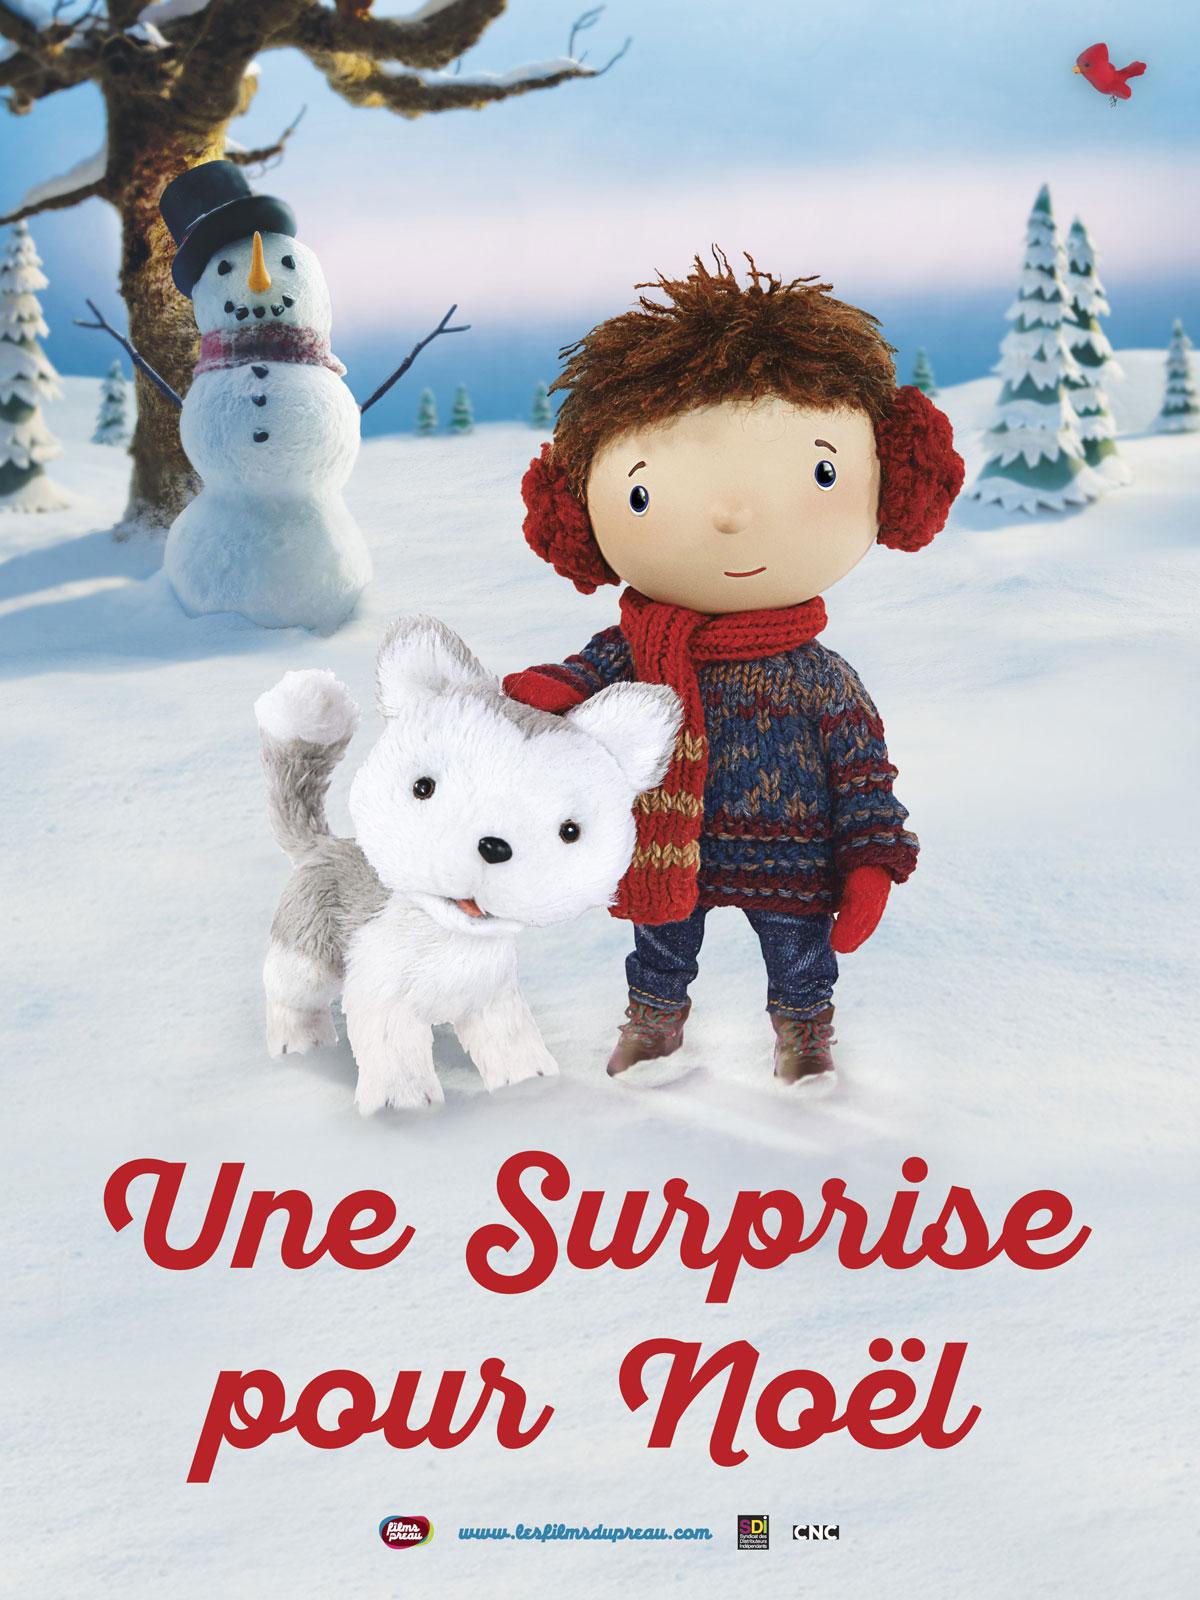 Joyeux Noel Streaming.Dessin Anime De Noel En Streaming